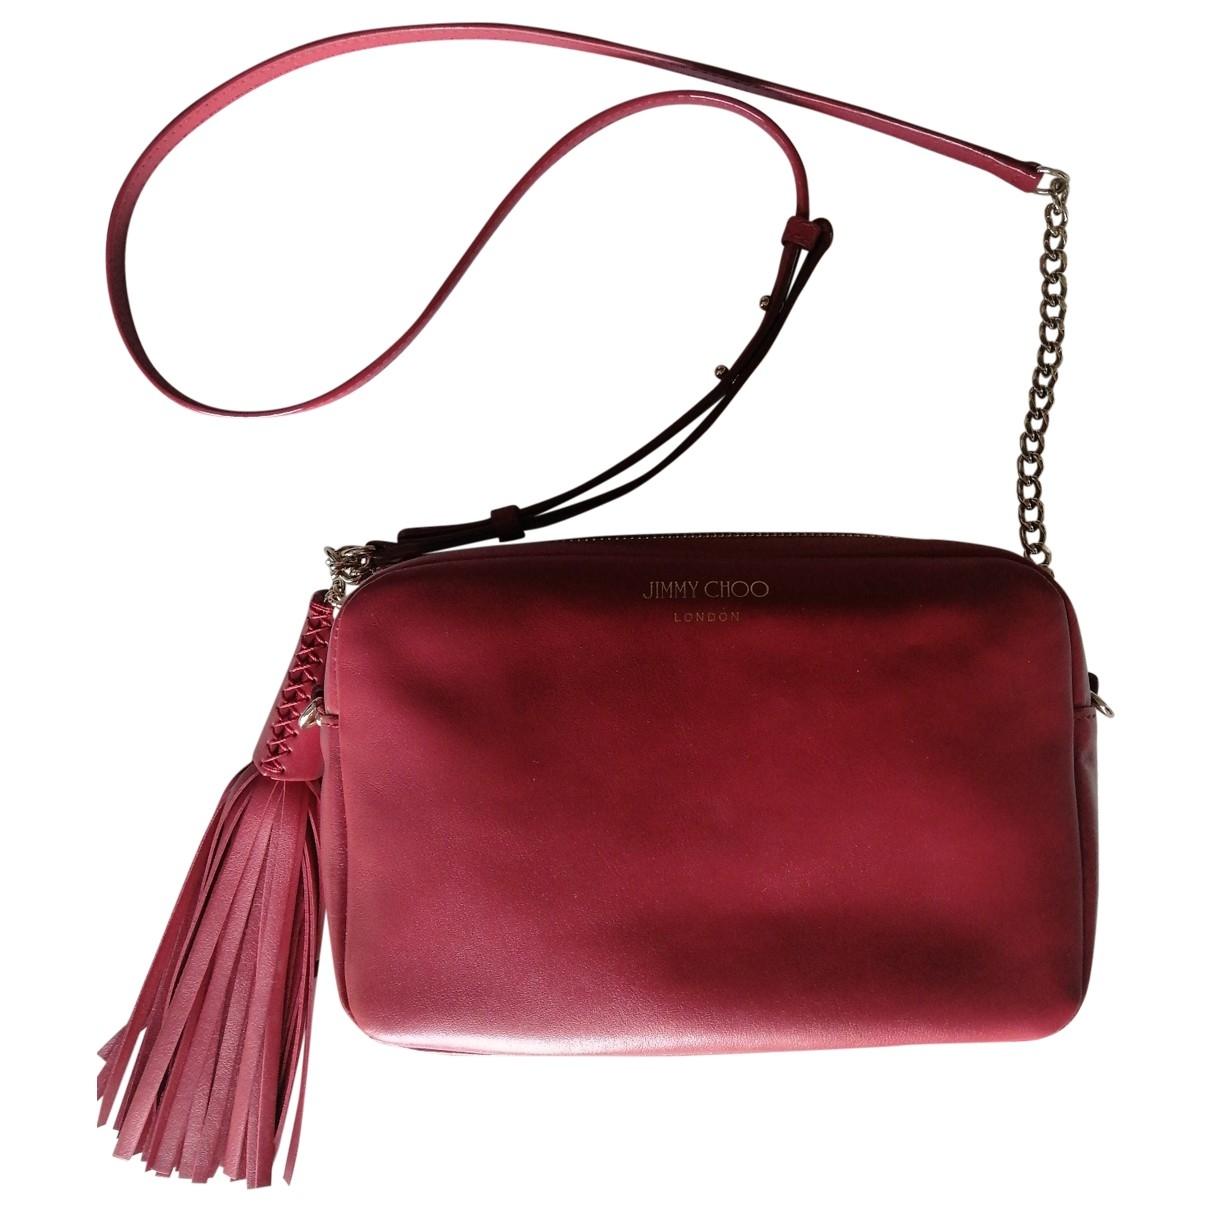 Jimmy Choo \N Handtasche in  Rot Leder